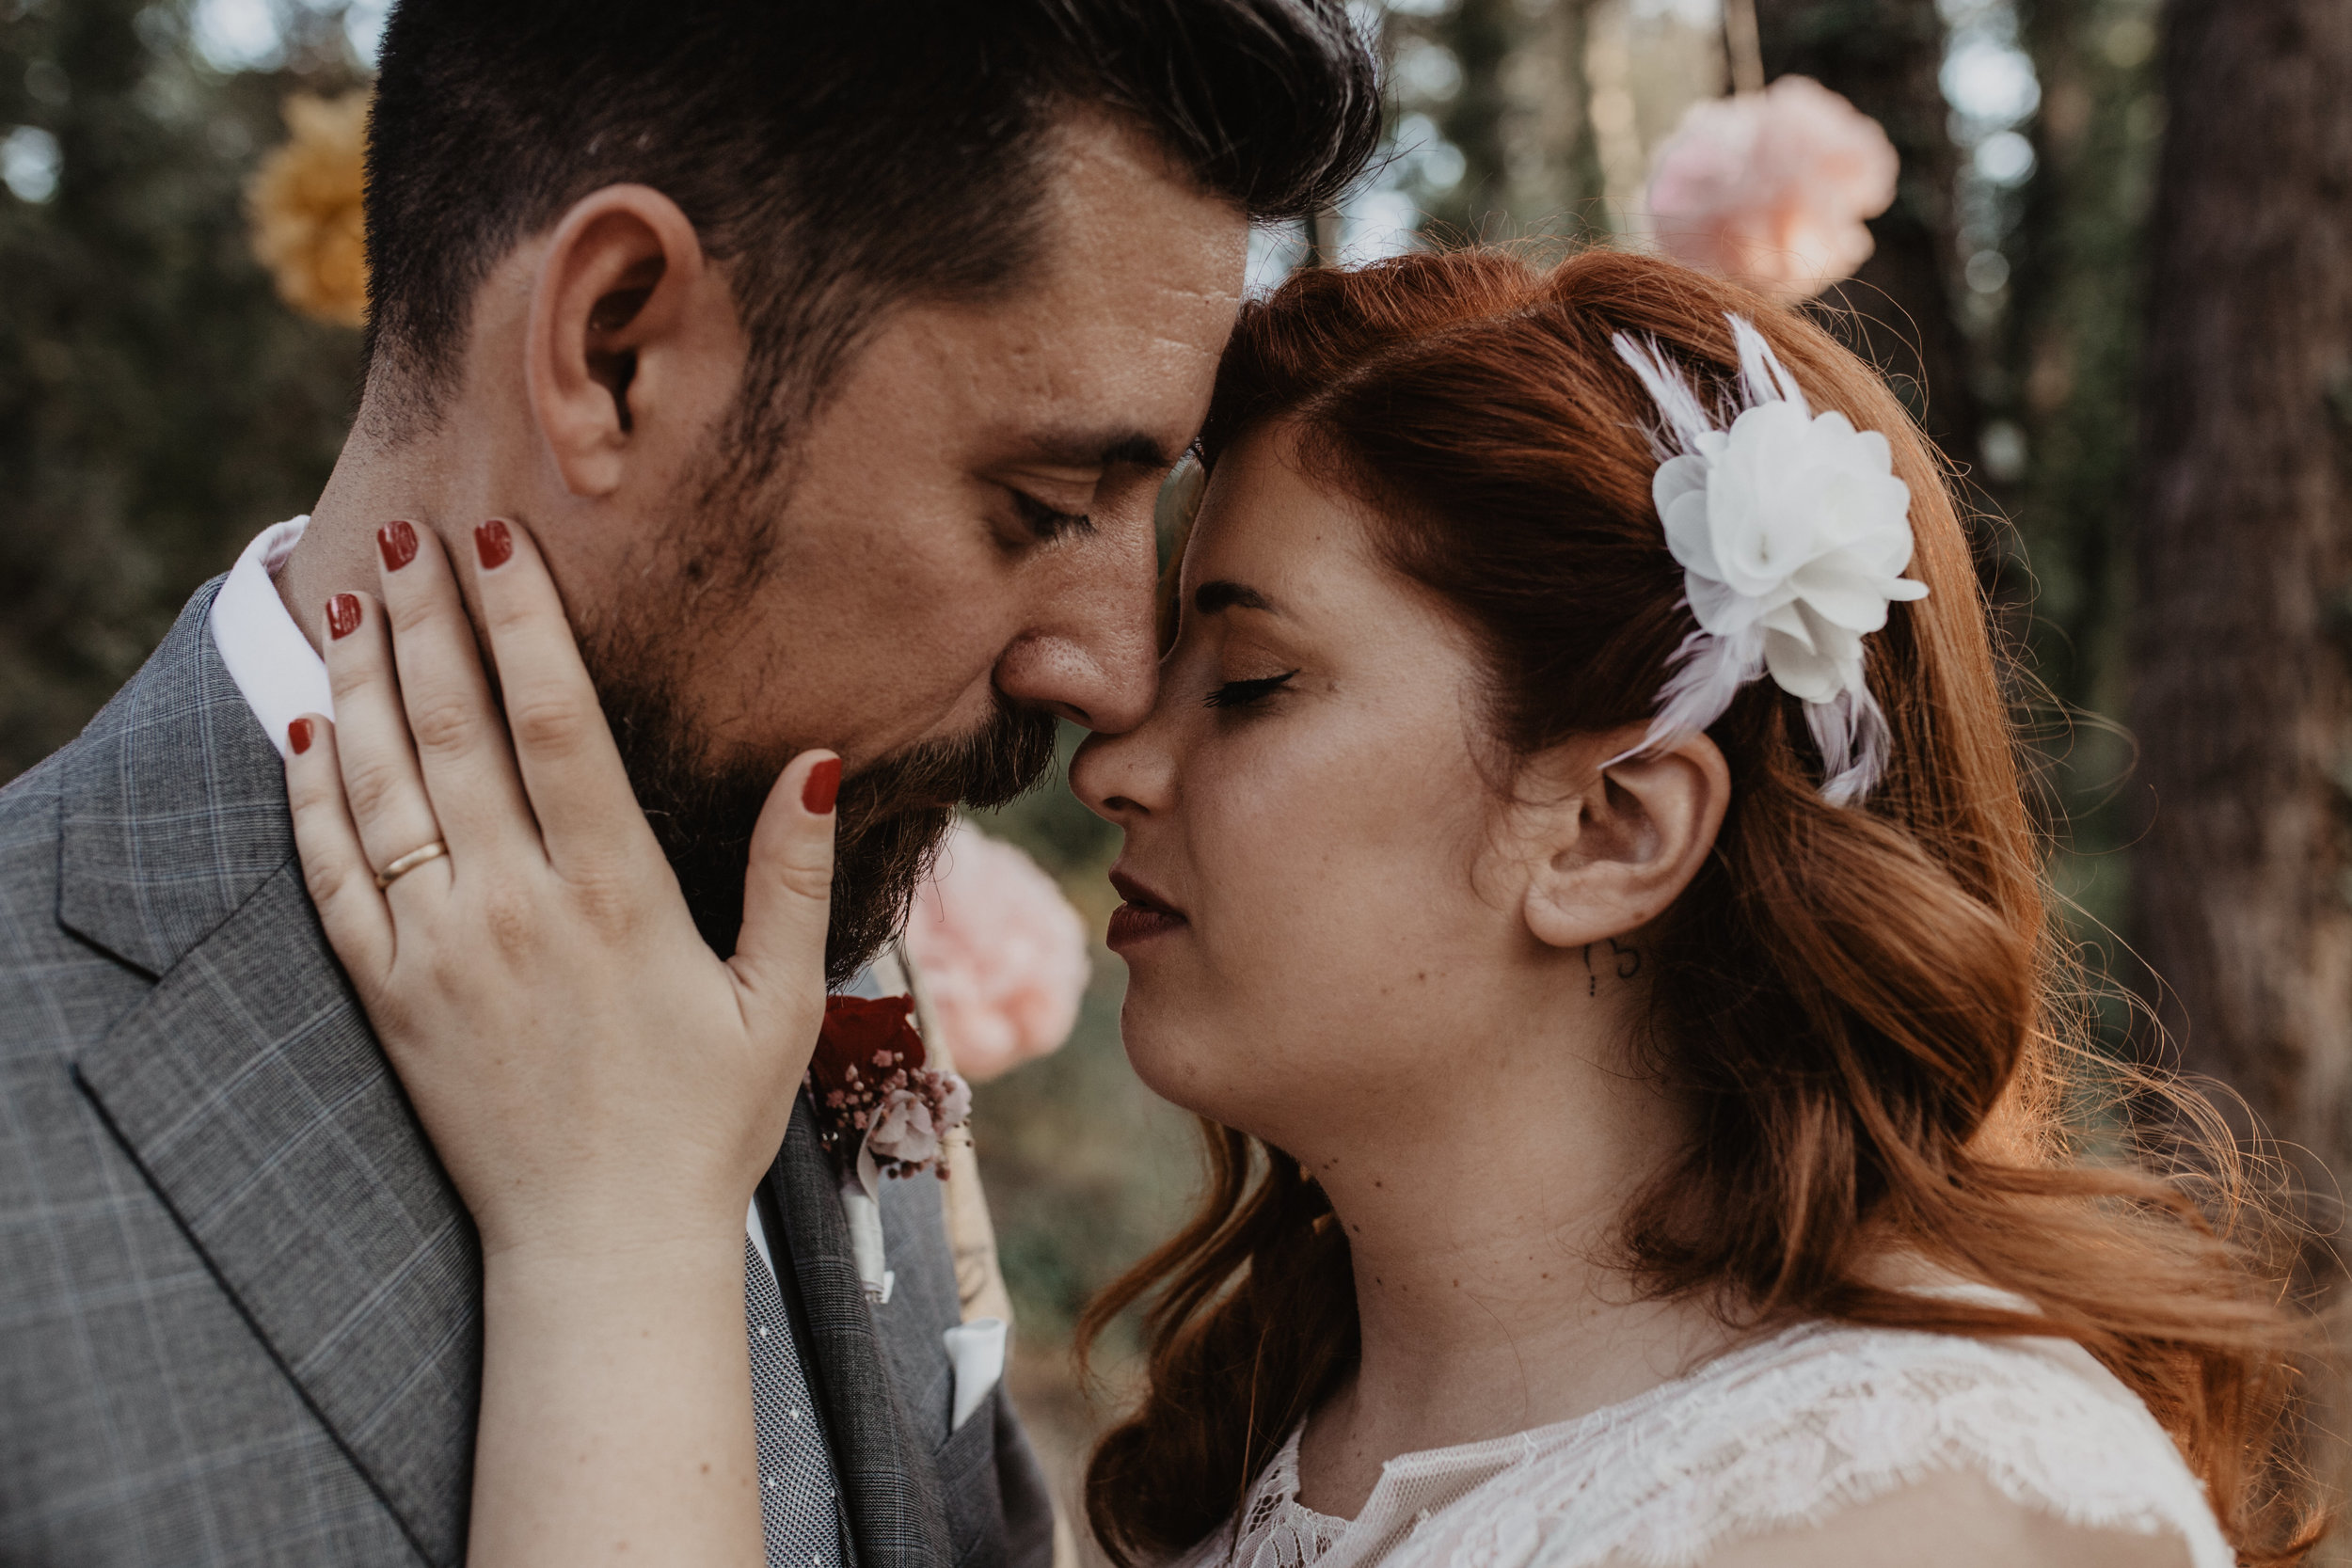 thenortherngirlphotography_photography_thenortherngirl_rebeccascabros_wedding_weddingphotography_masialagarrigadecastelladral_joaniemma_bodaenbarcelona_weddingphotographer_emmaijoan-492.jpg